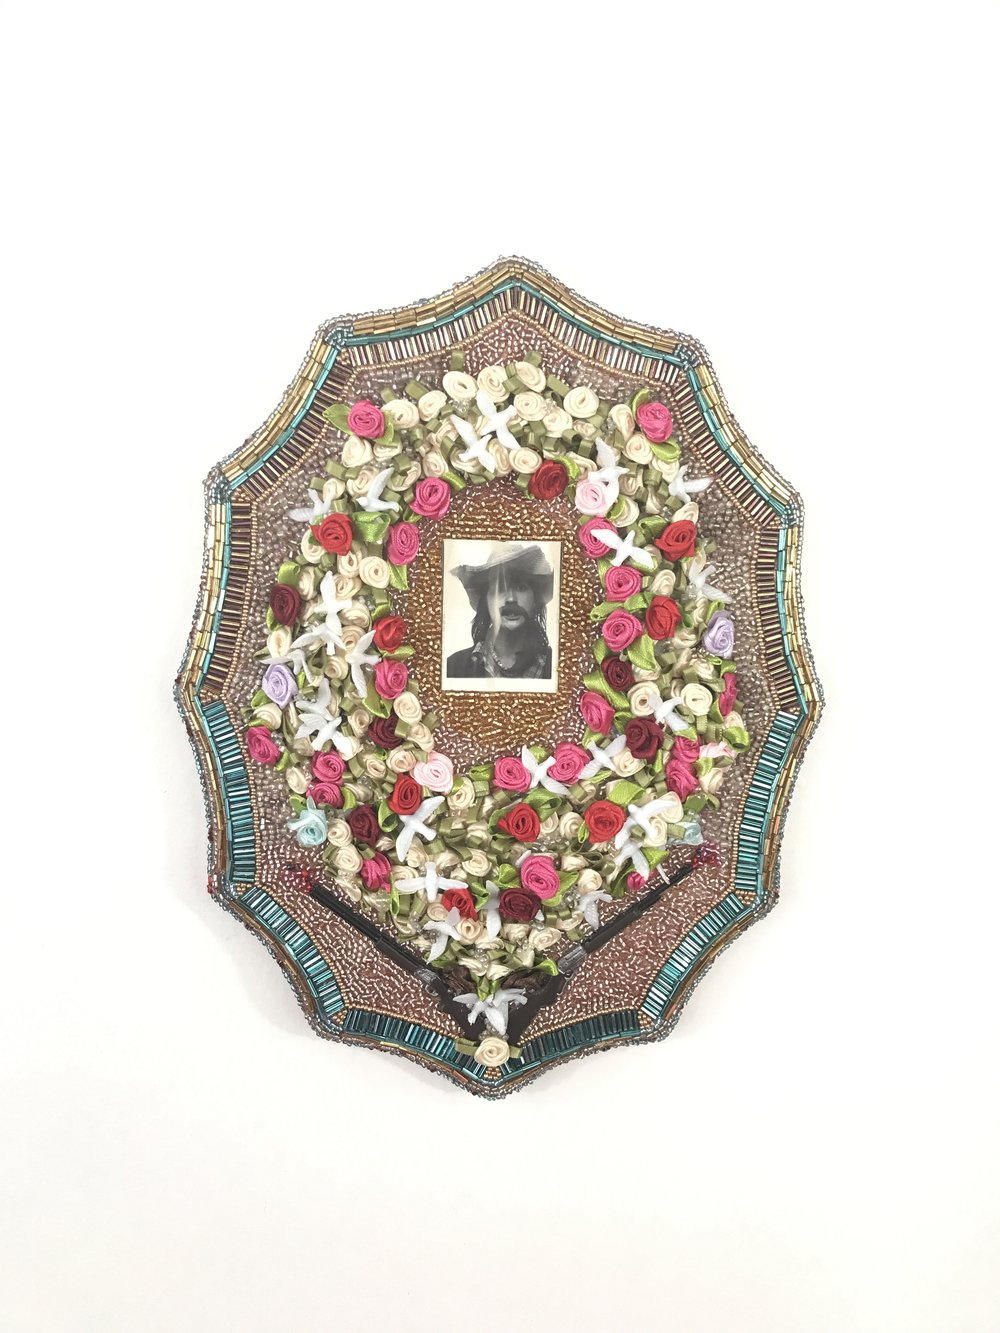 Nacho AKA Paloma - Multimedia assemblage (photograph, beads, miniatures), 12